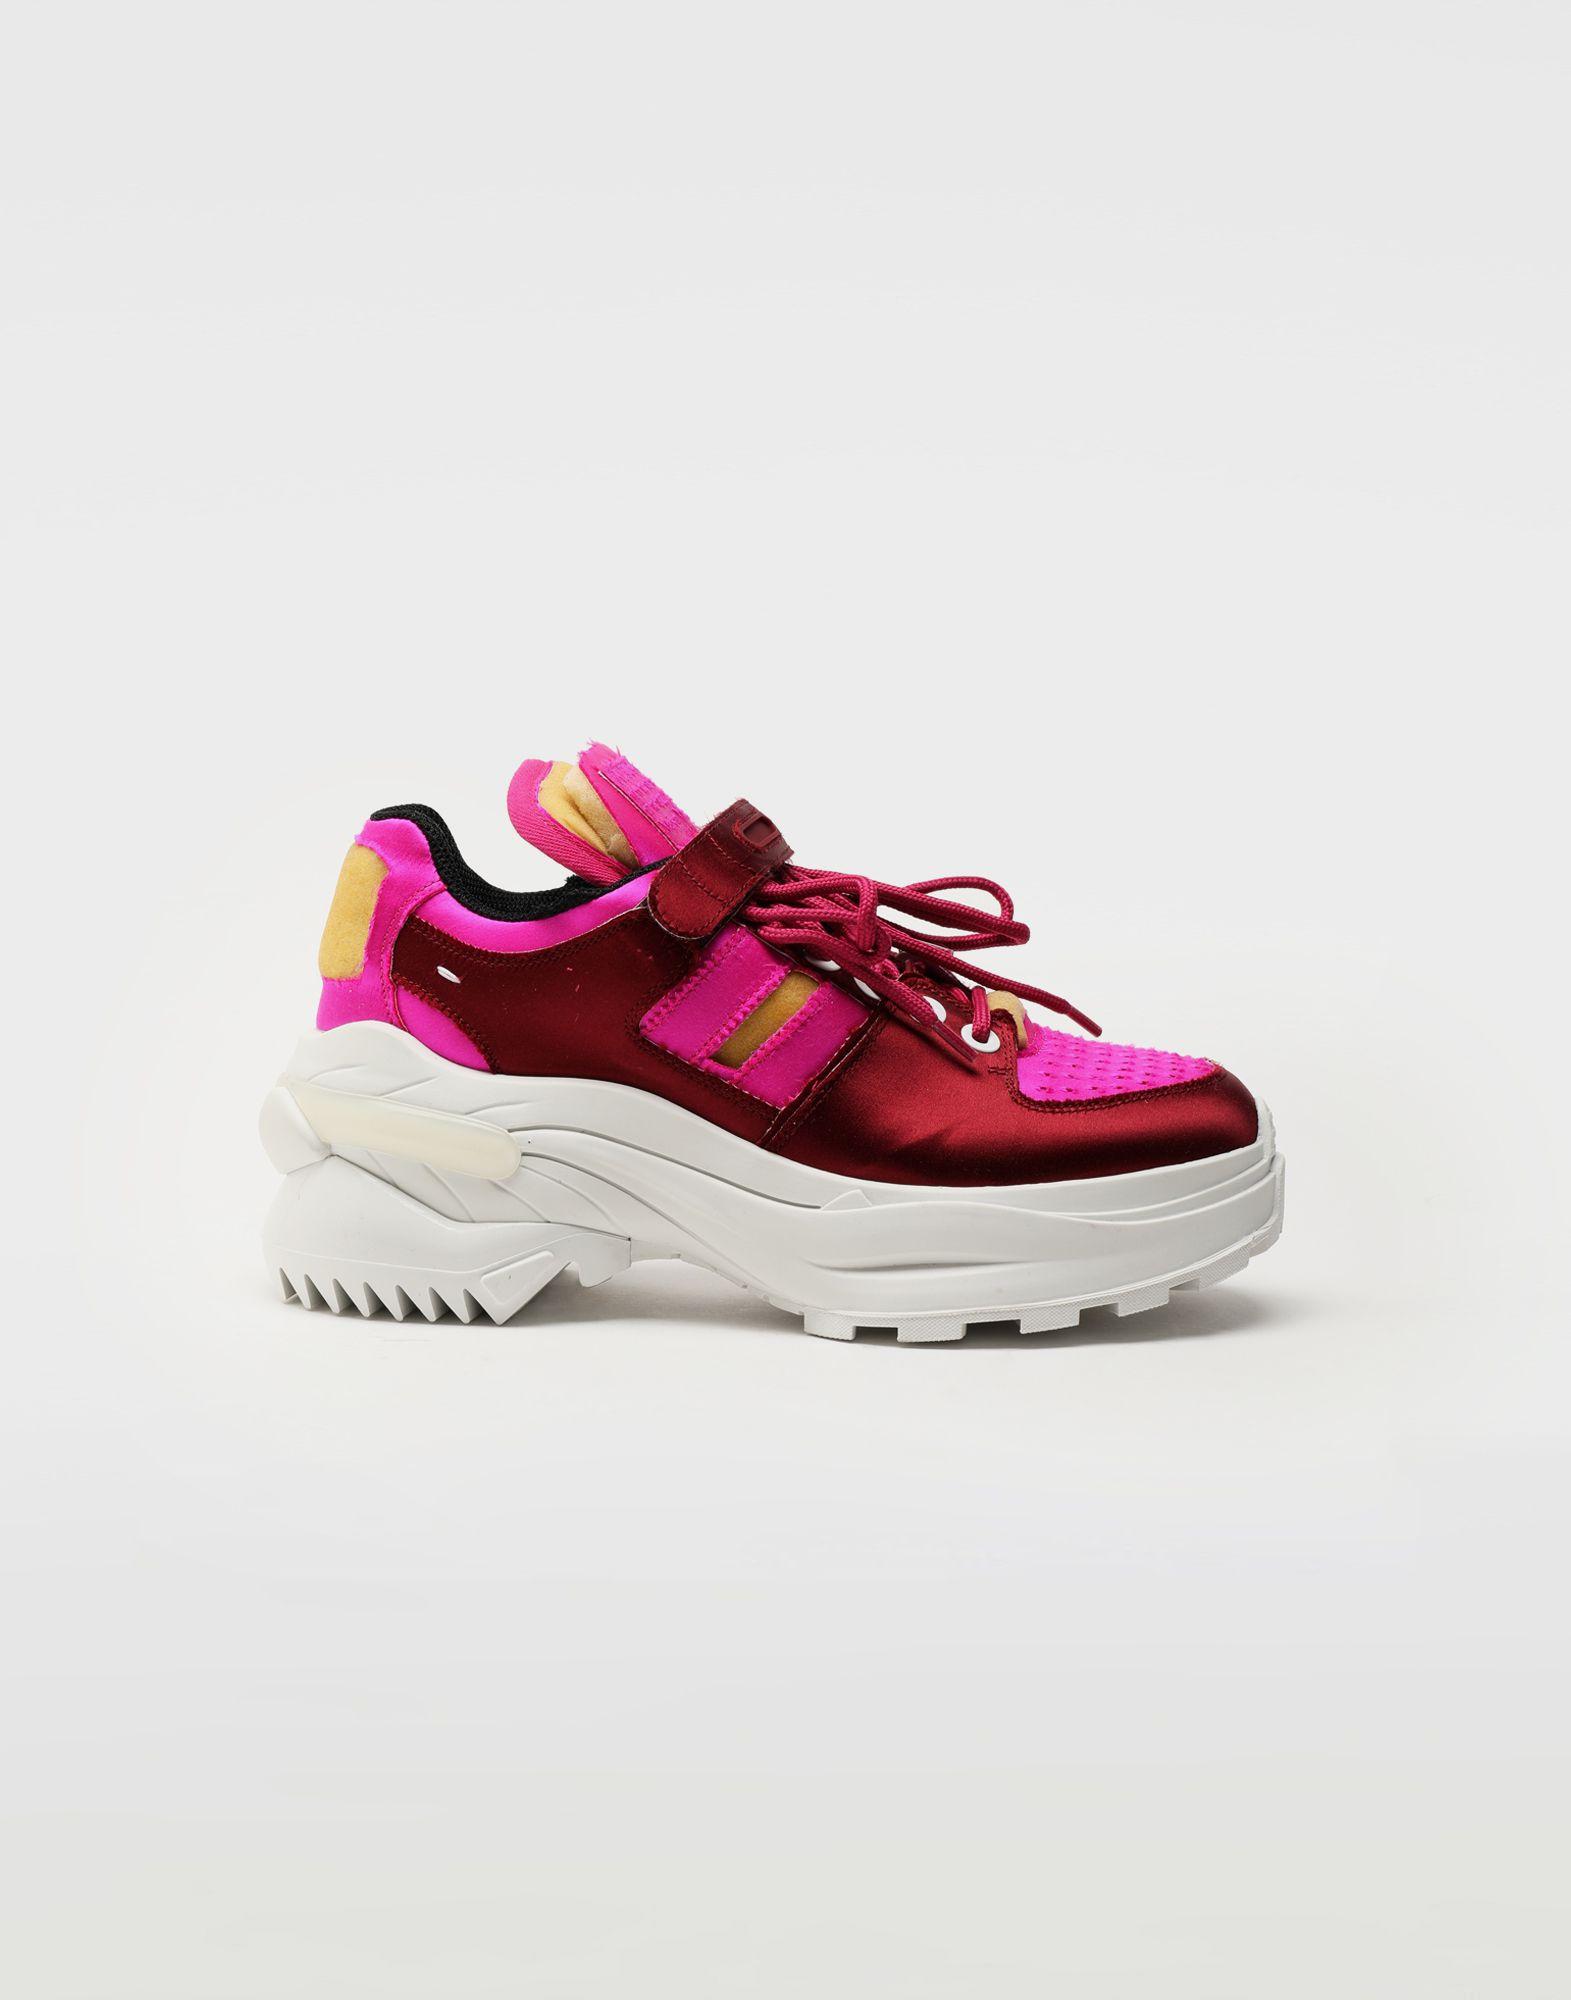 MAISON MARGIELA Retro Fit satin sneakers Sneakers Woman f